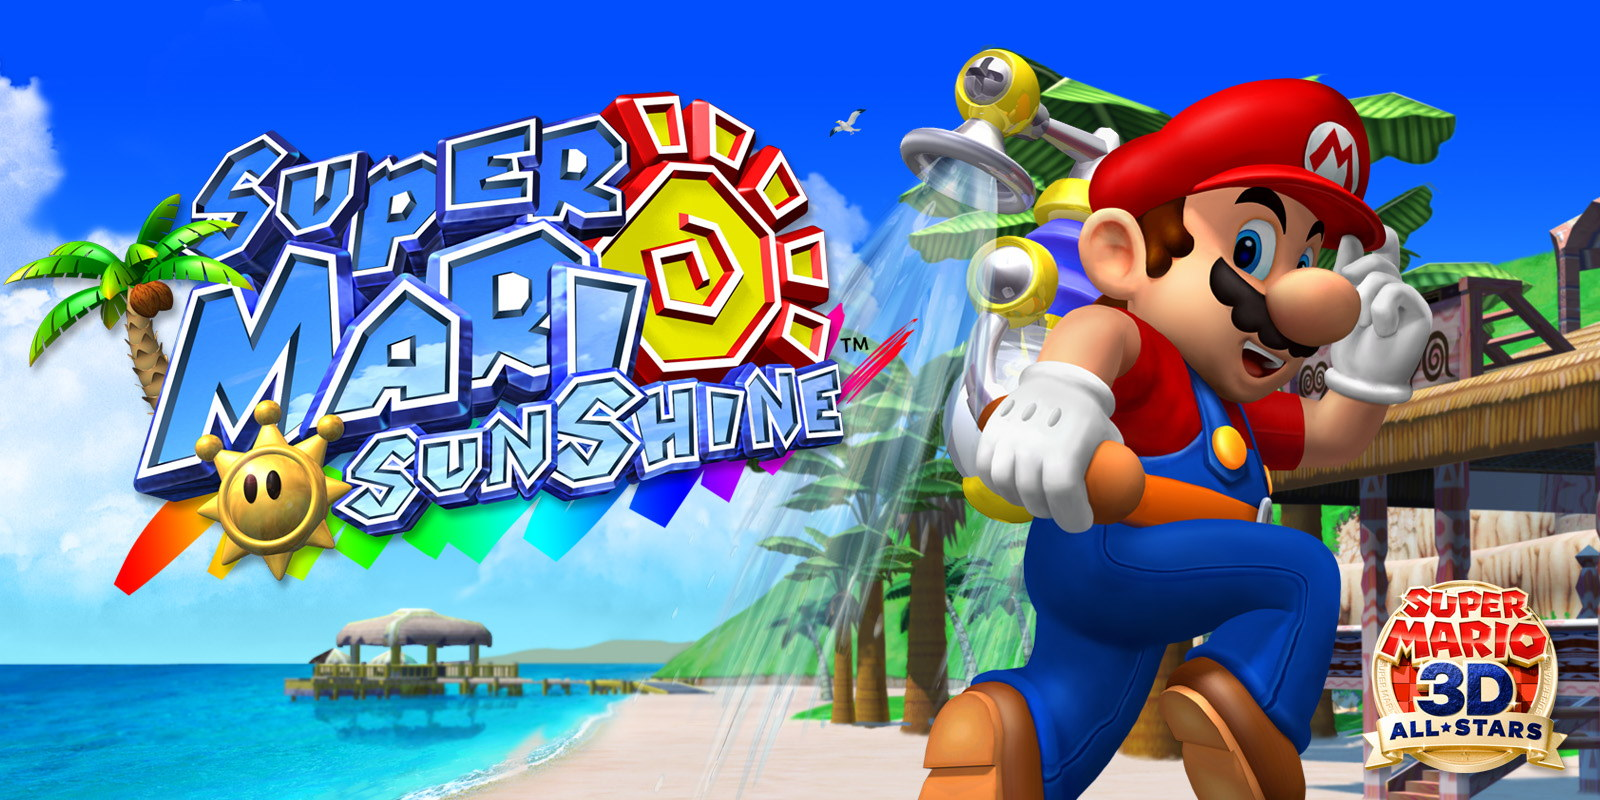 Super Mario 3D All-Stars Super Mario Sunshine